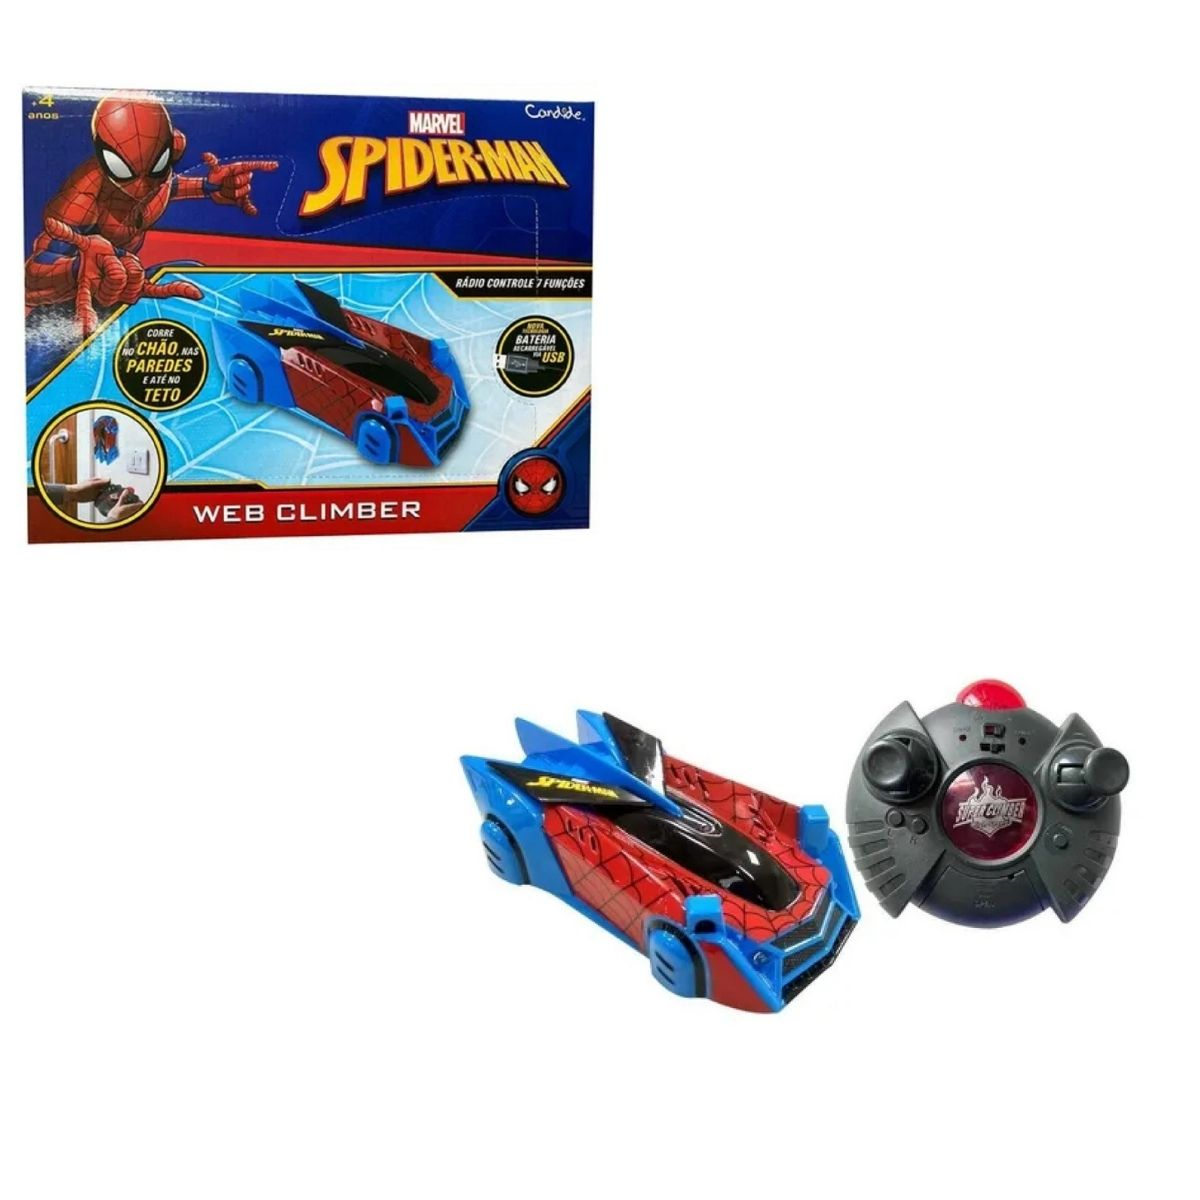 Carro Controle SPIDER-MAN Web Climber Anda Na Parede e Teto